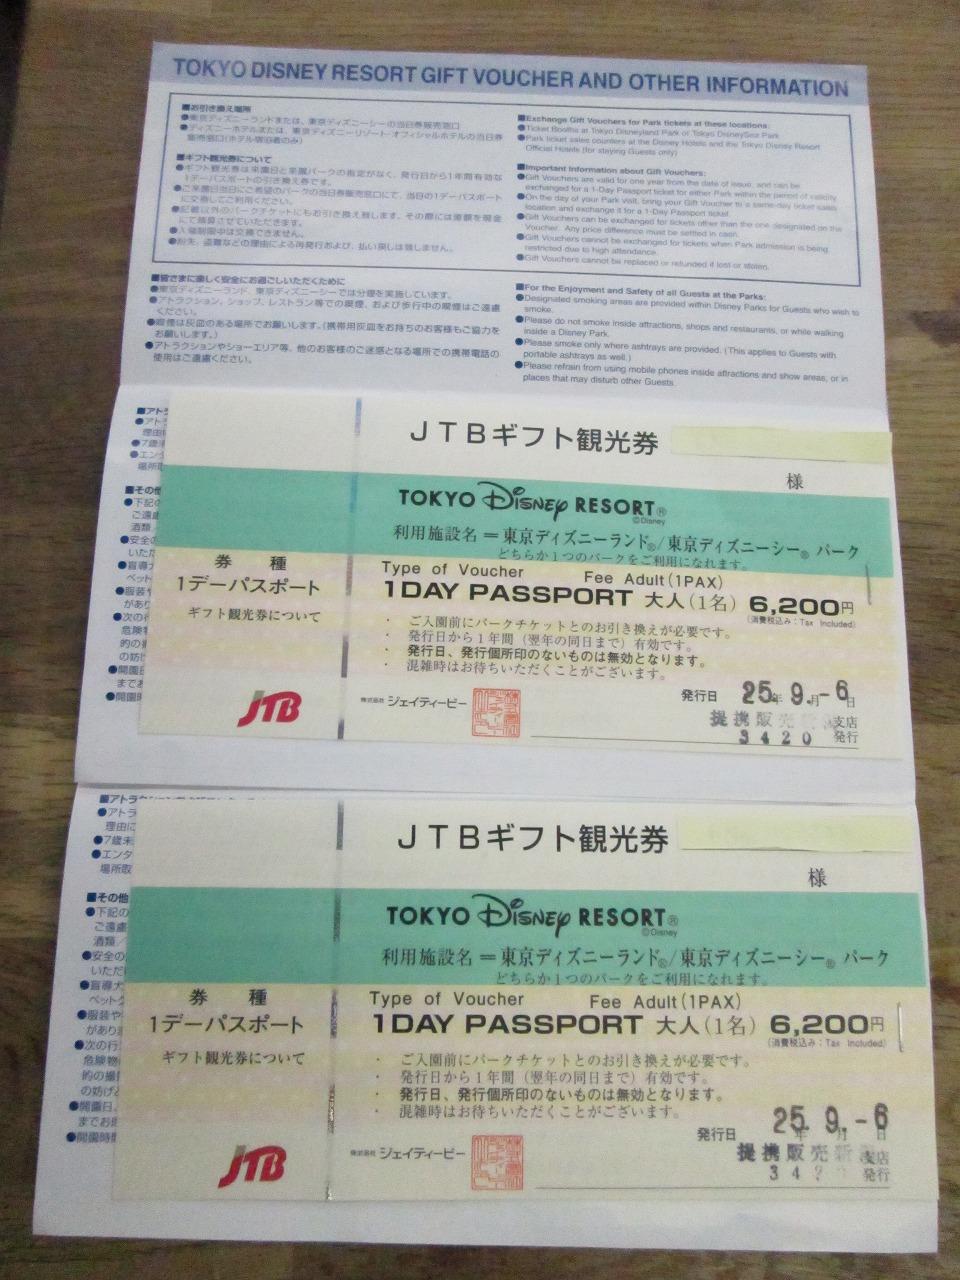 tdr 東京ディズニーランド】ディズニーシー 1day パスポート jtb